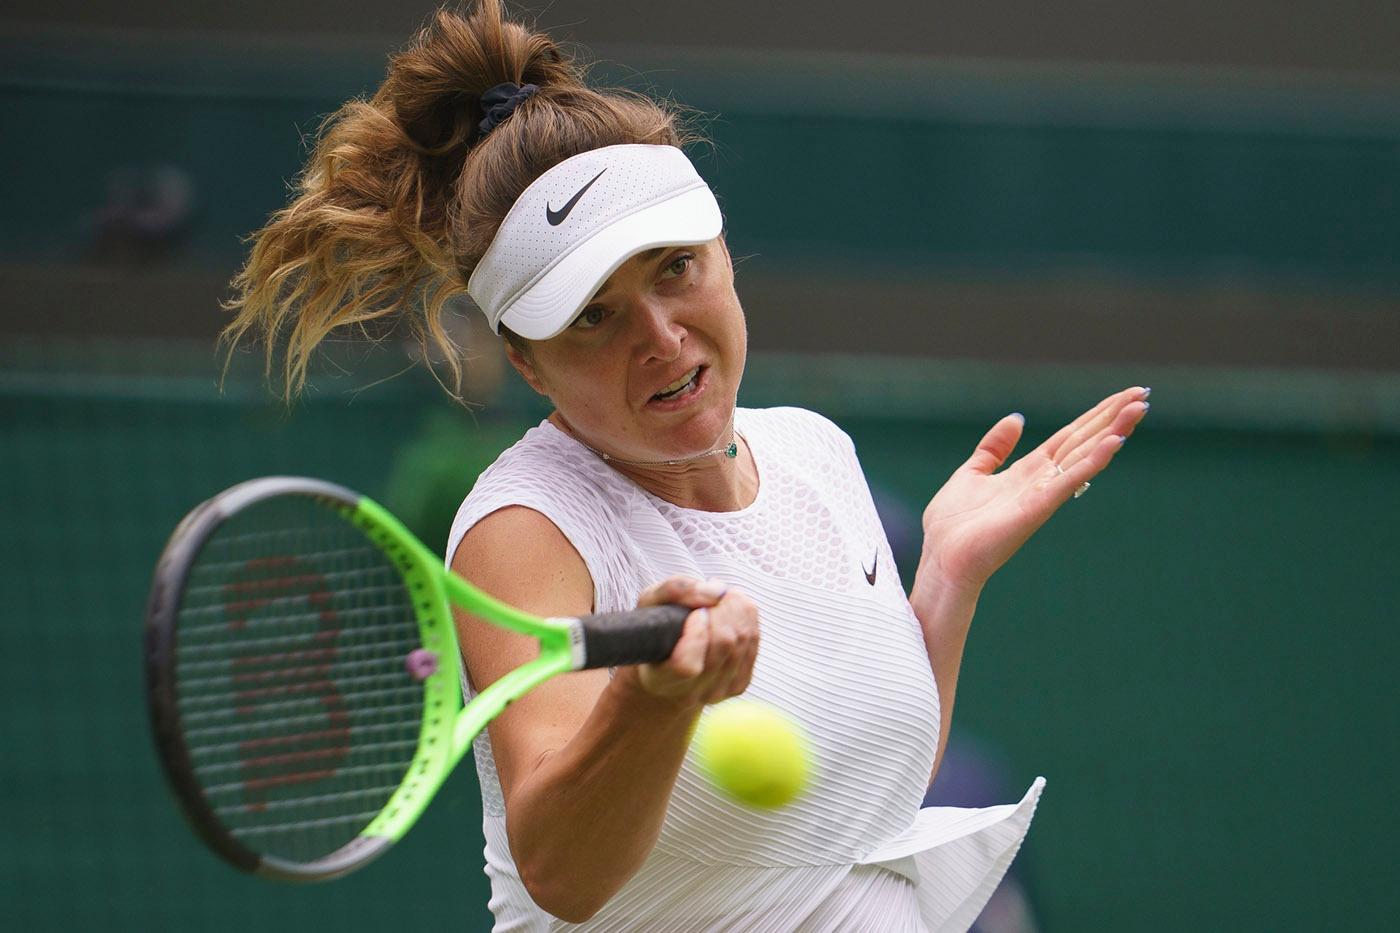 Tokyo 2020 Olympics: Elina Svitolina vs. Laura Siegemund Tennis Pick and Prediction